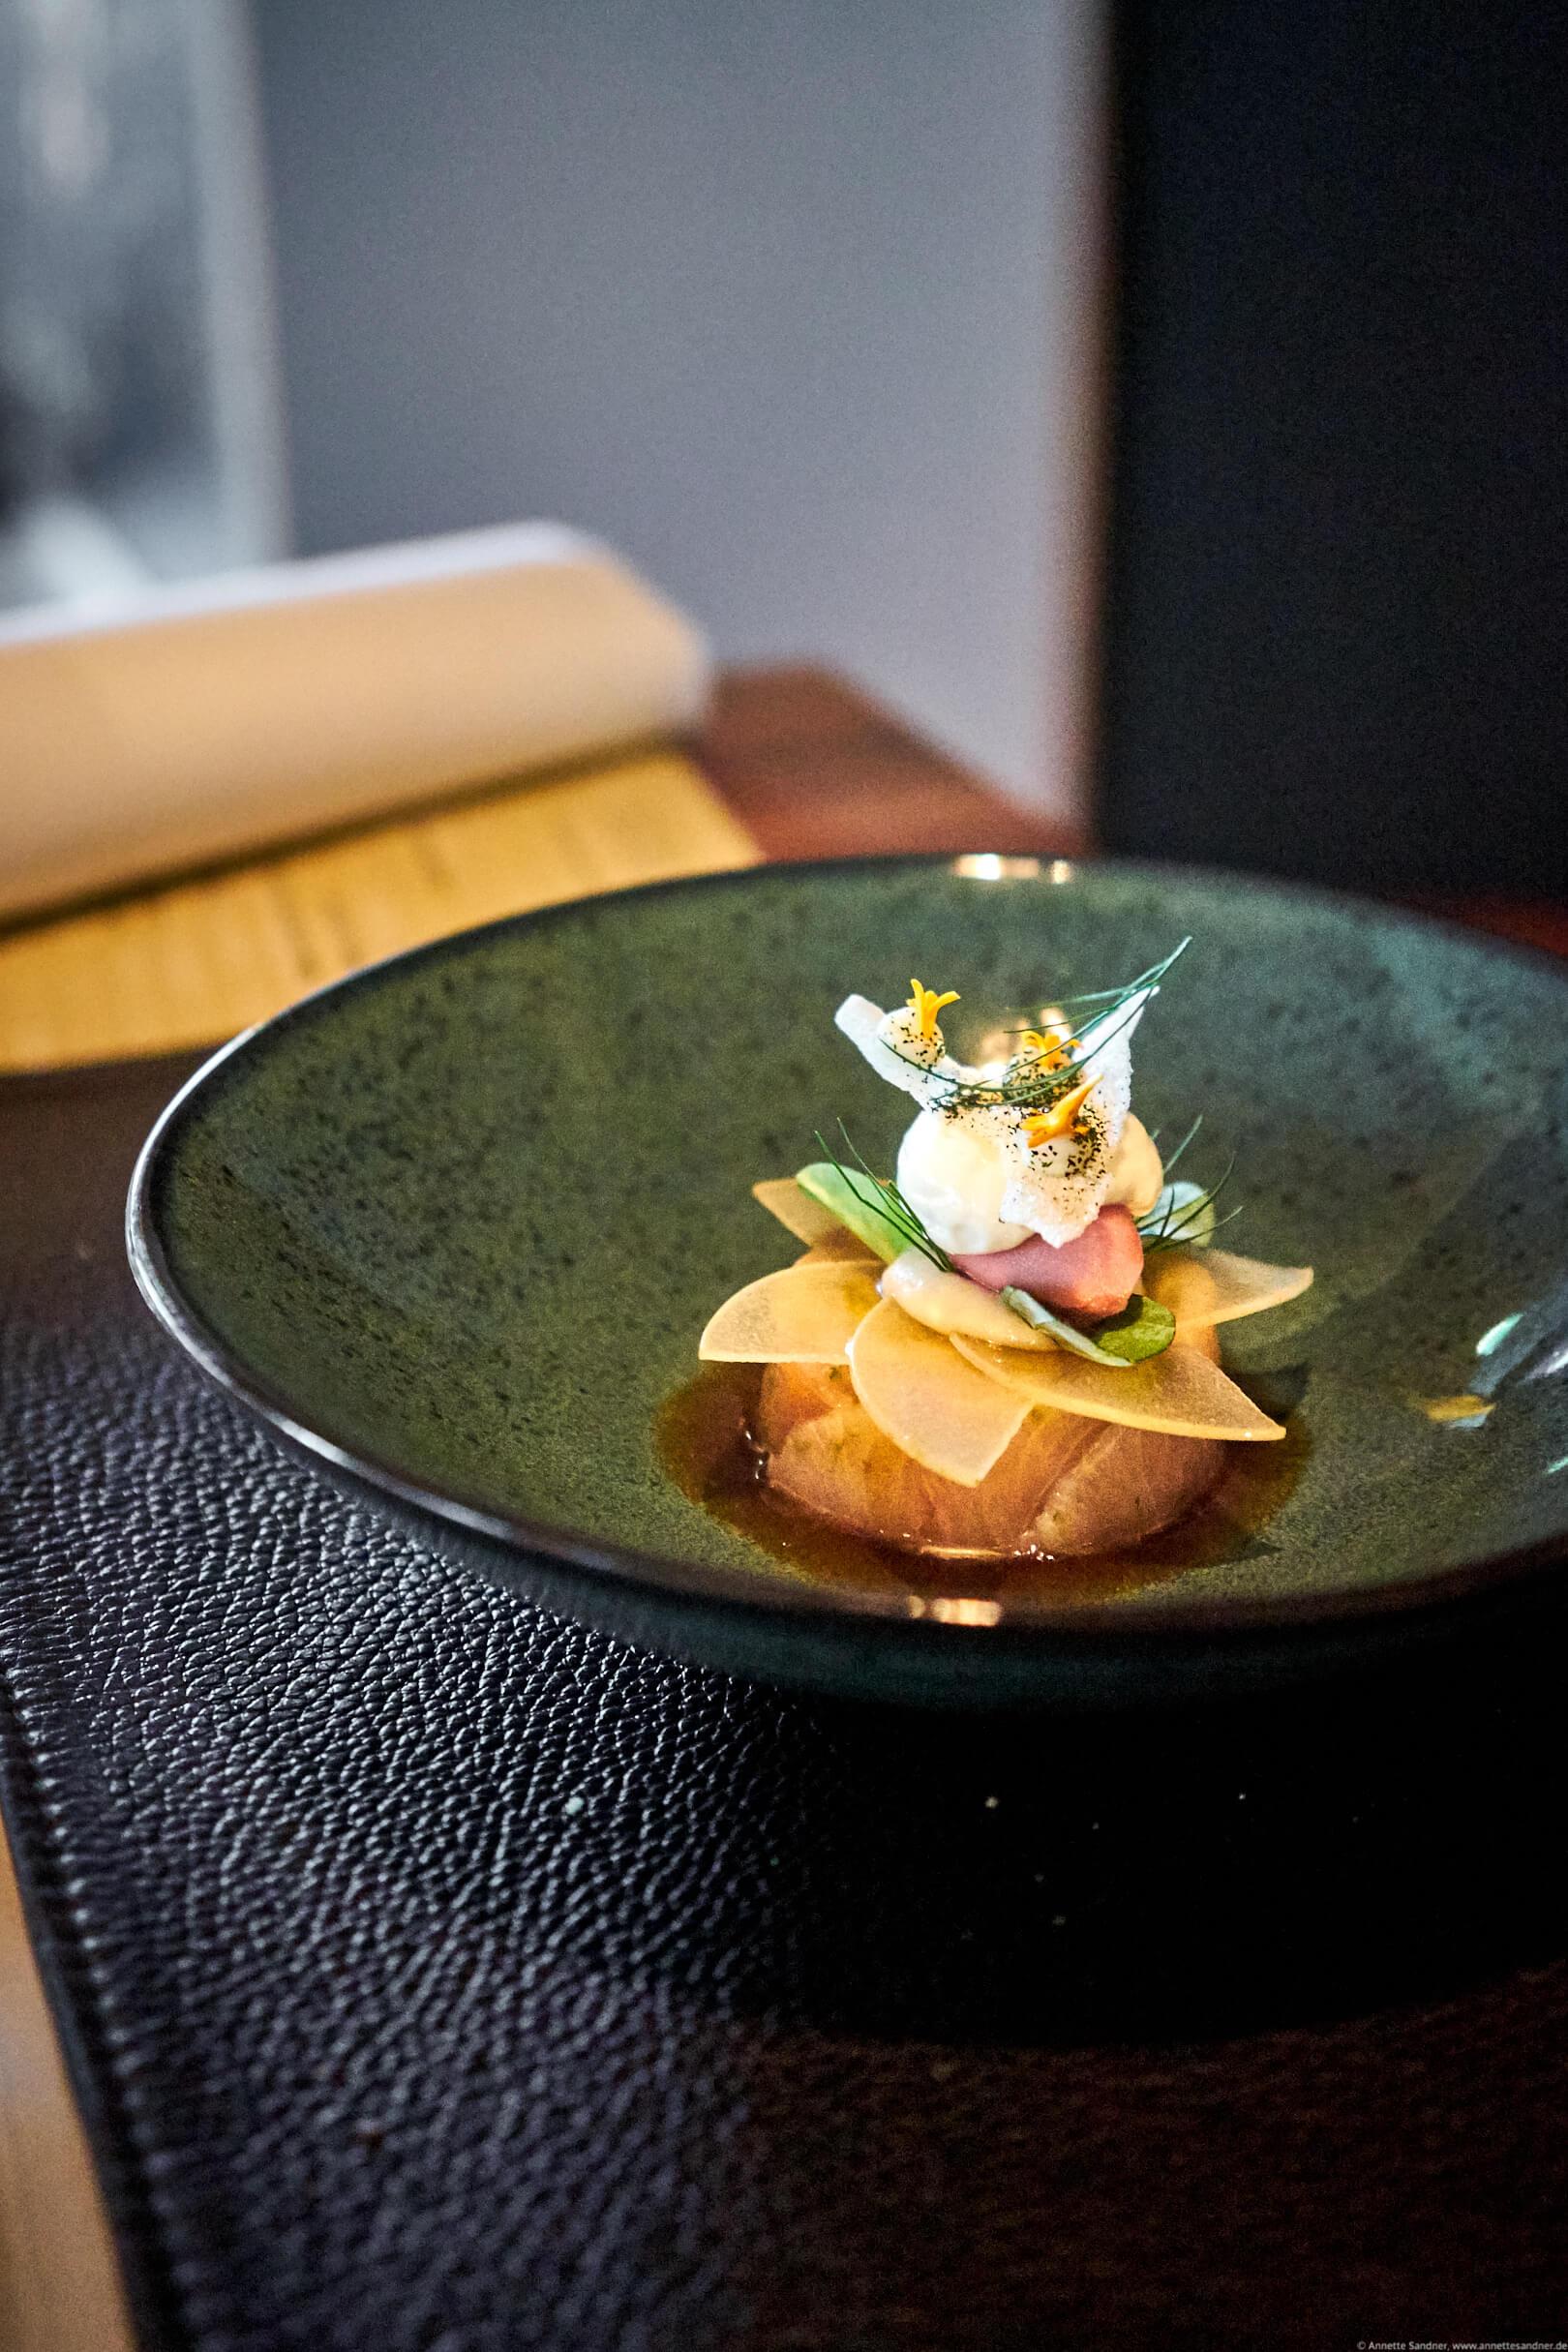 Restaurant Goldberg, Fellbach - Hamachi